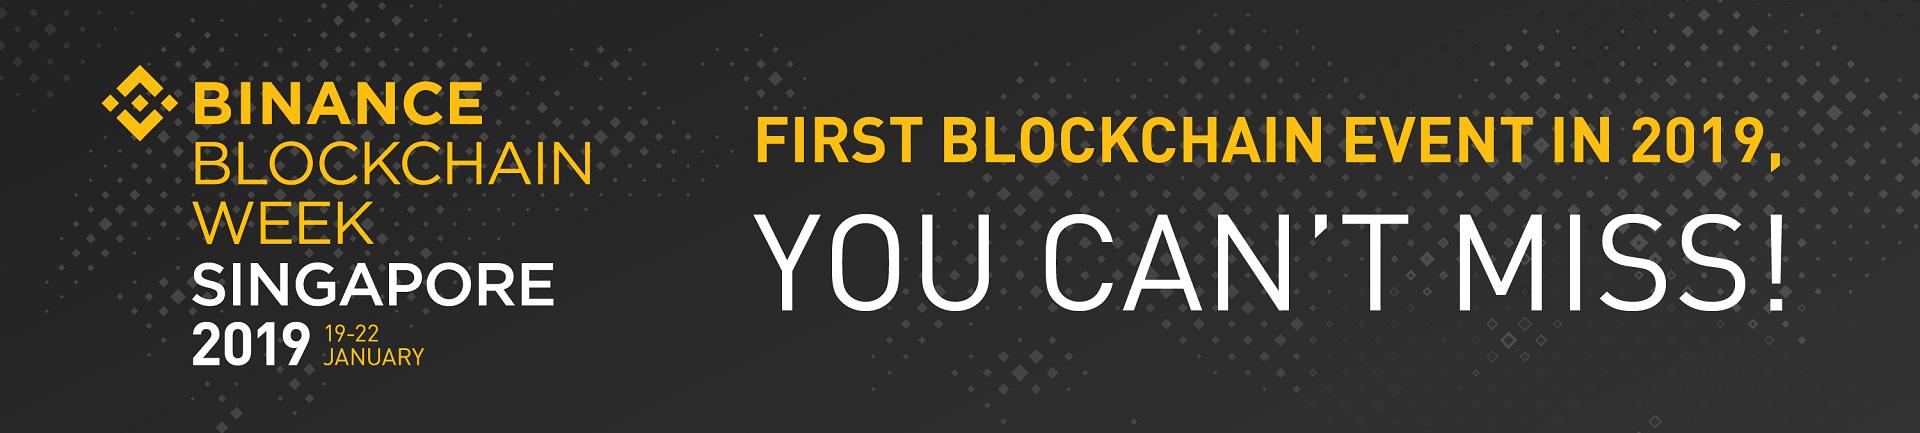 Binance Blockchain Week Singapore 2019 Banner Image